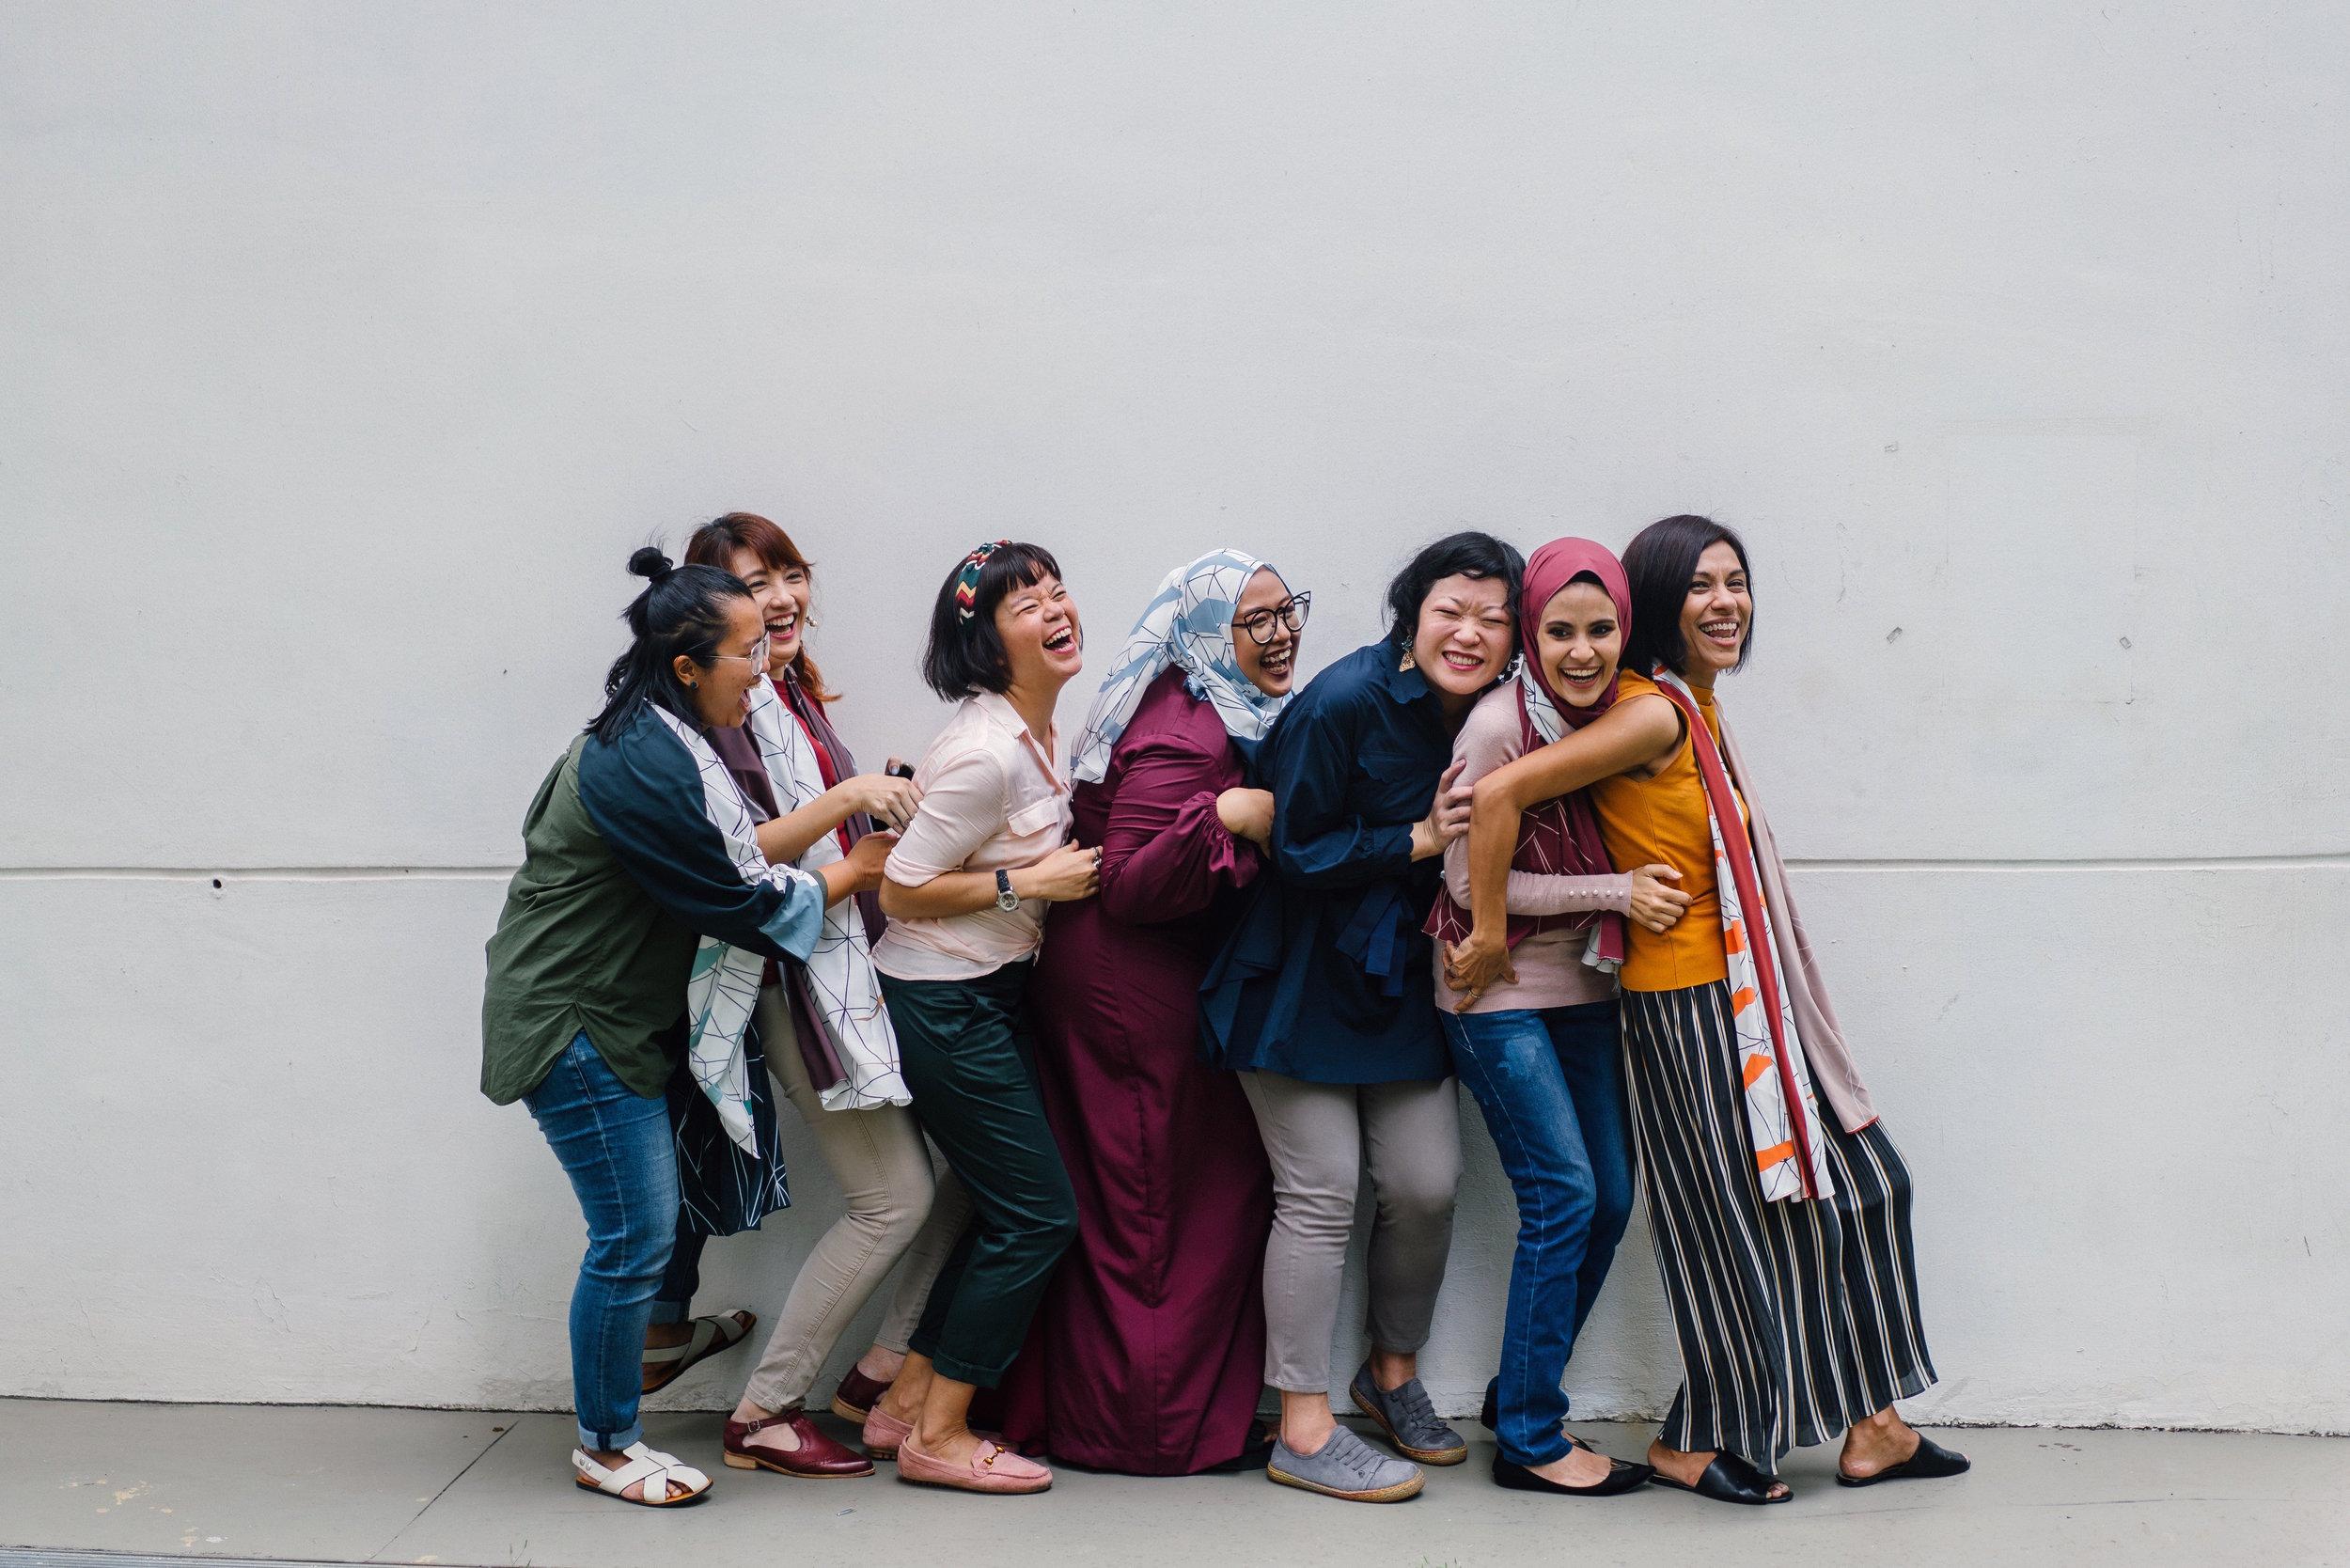 casual-diversity-female-1206059 sm.jpeg